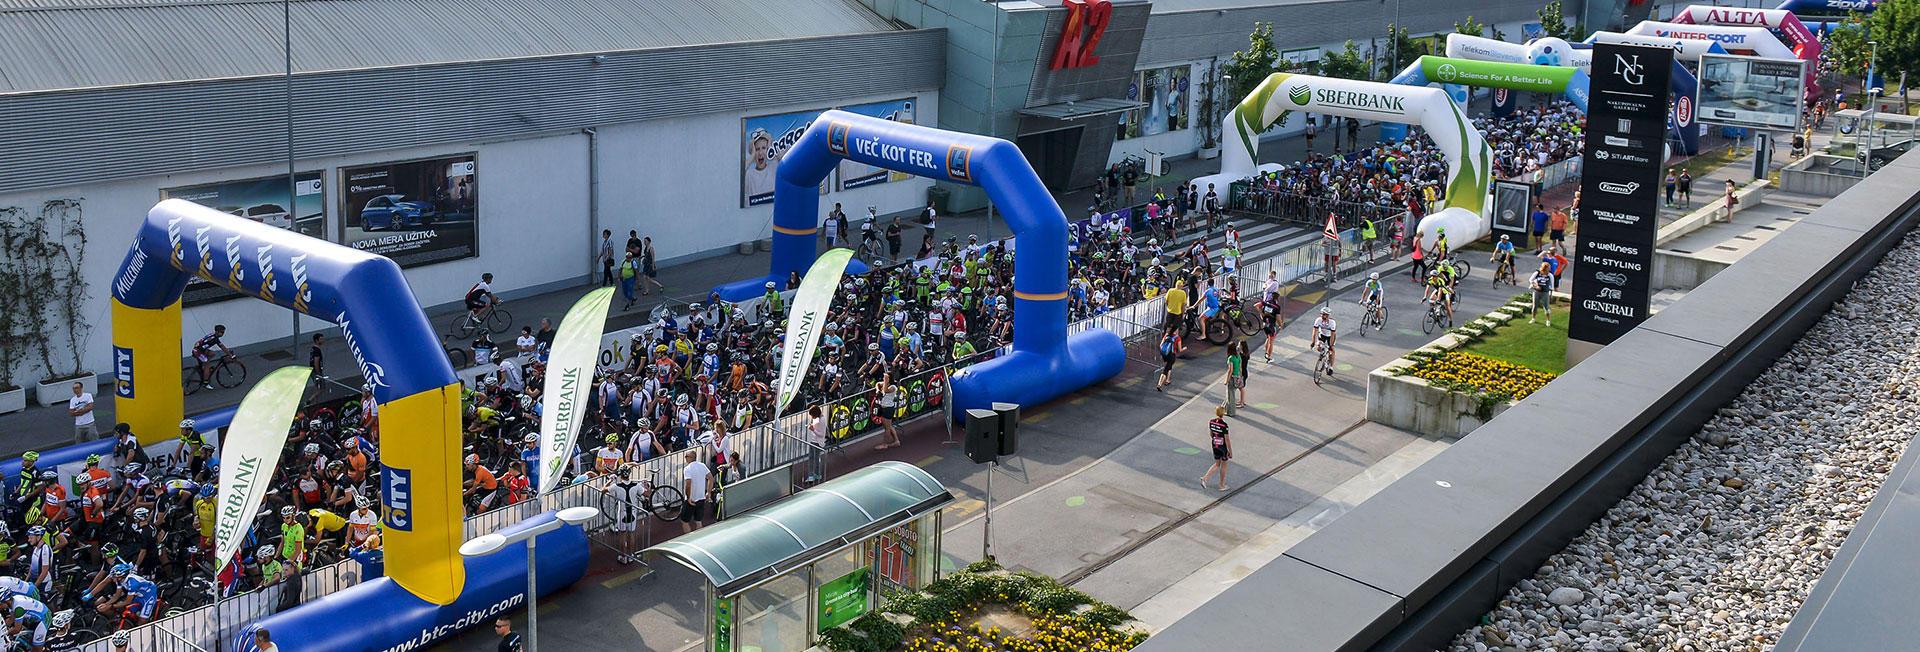 Maraton Franja BTC City 2016 10.-12. junij 2016